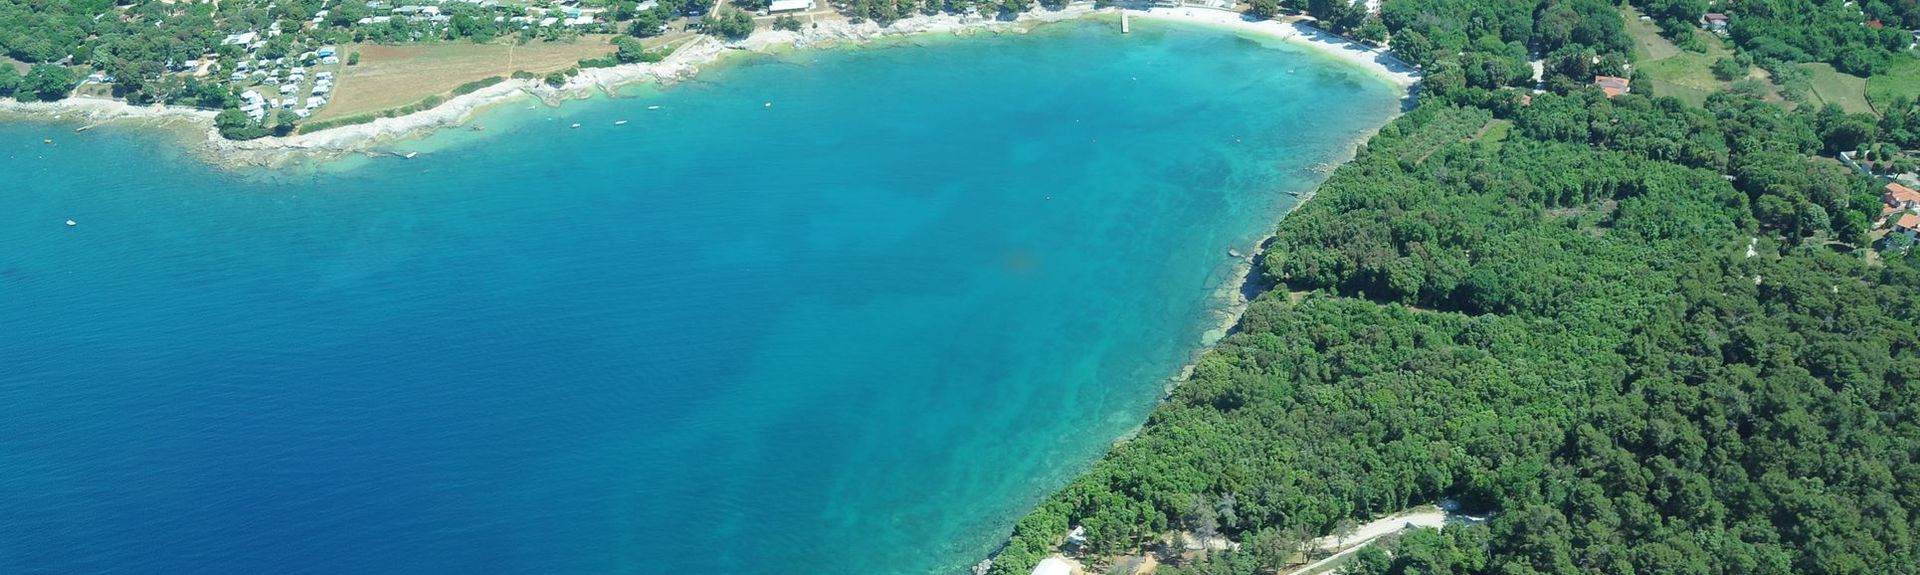 Pomer, Medulin, Istria (county), Croatia